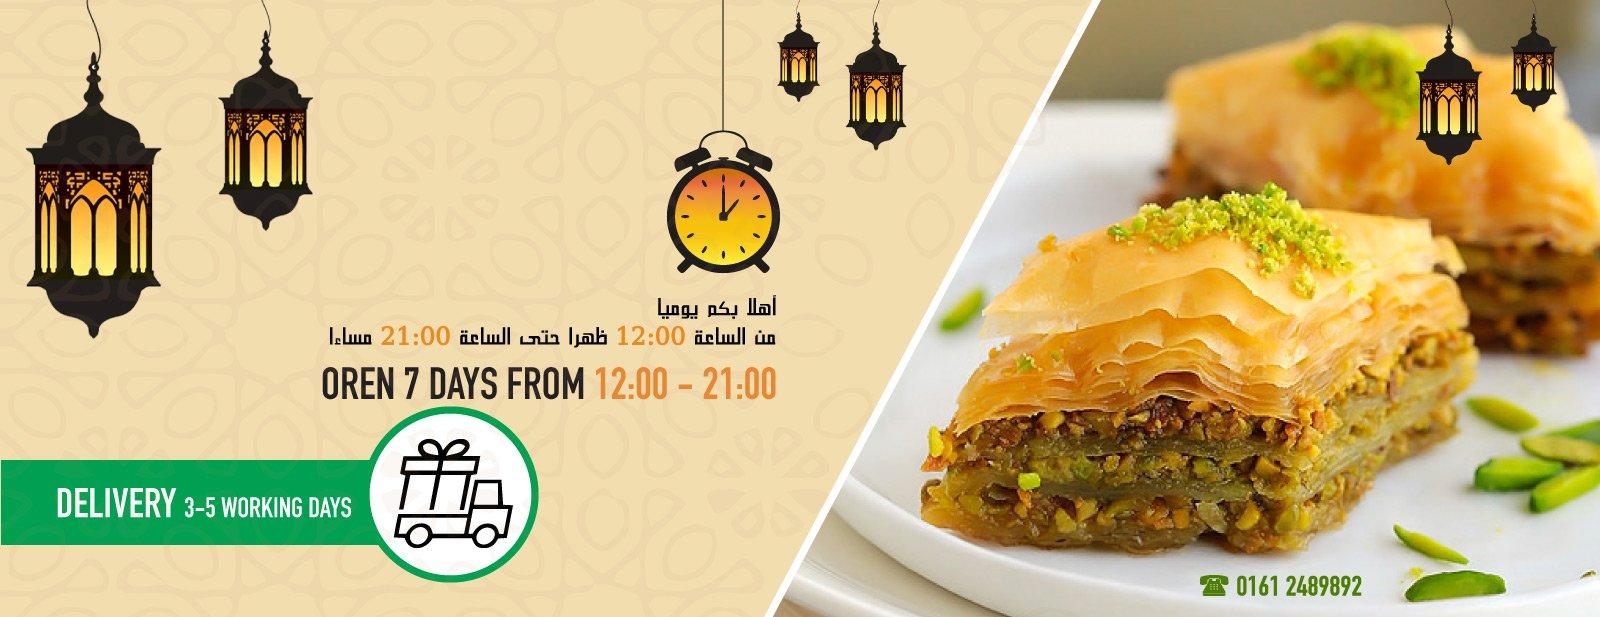 Syria-Sweet-Designs-Main-Ramadan-Slider